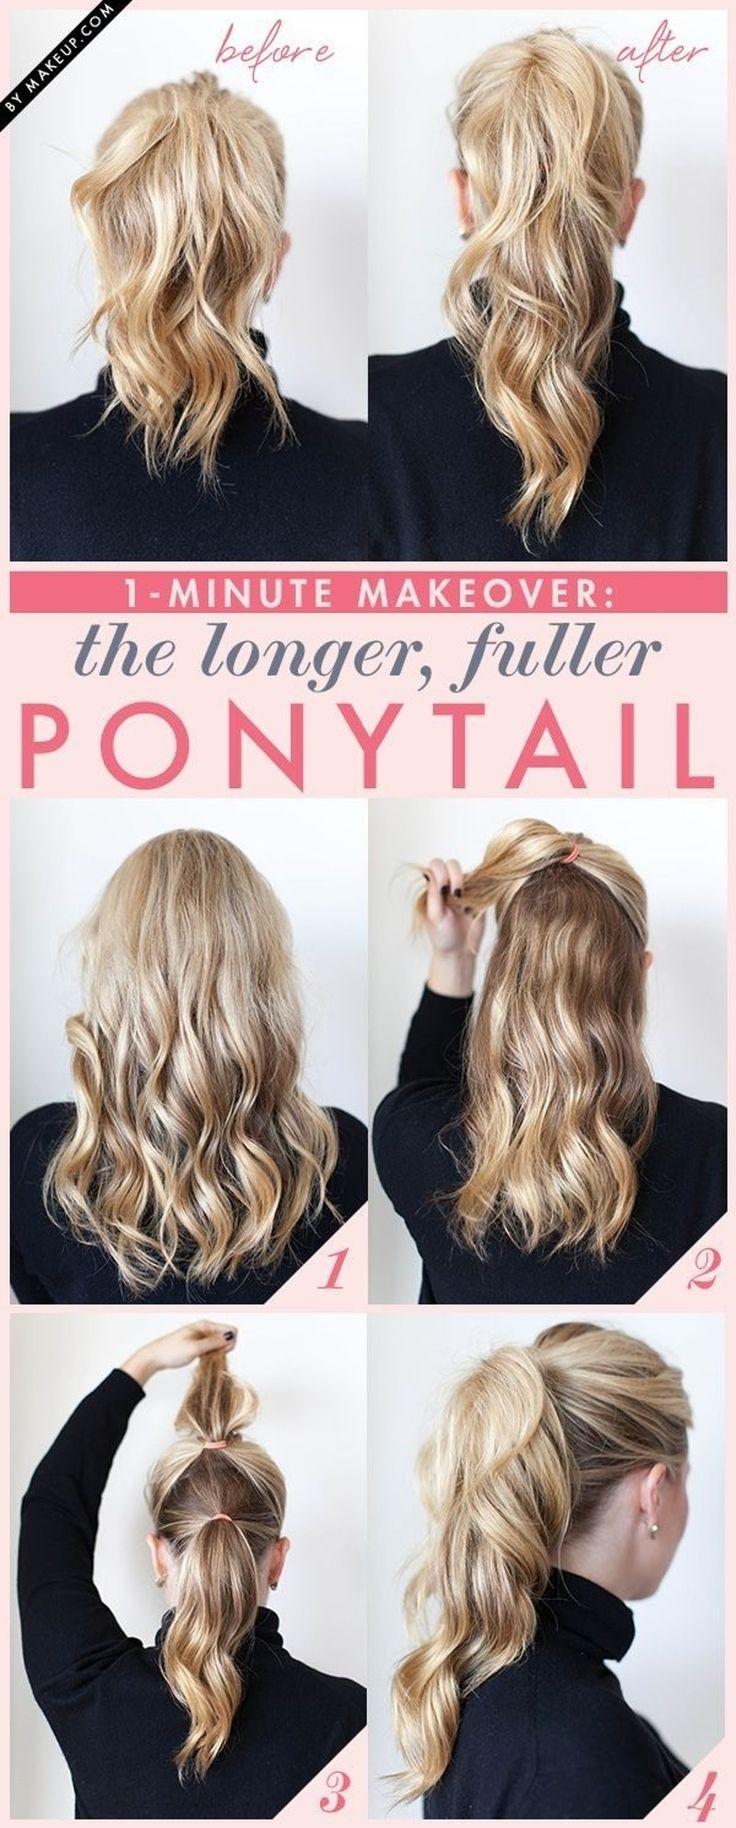 2. #Fuller Ponytail - 16 #Gorgeous Hair Styles for Lazy Girls like Me ... → Hair #Styles